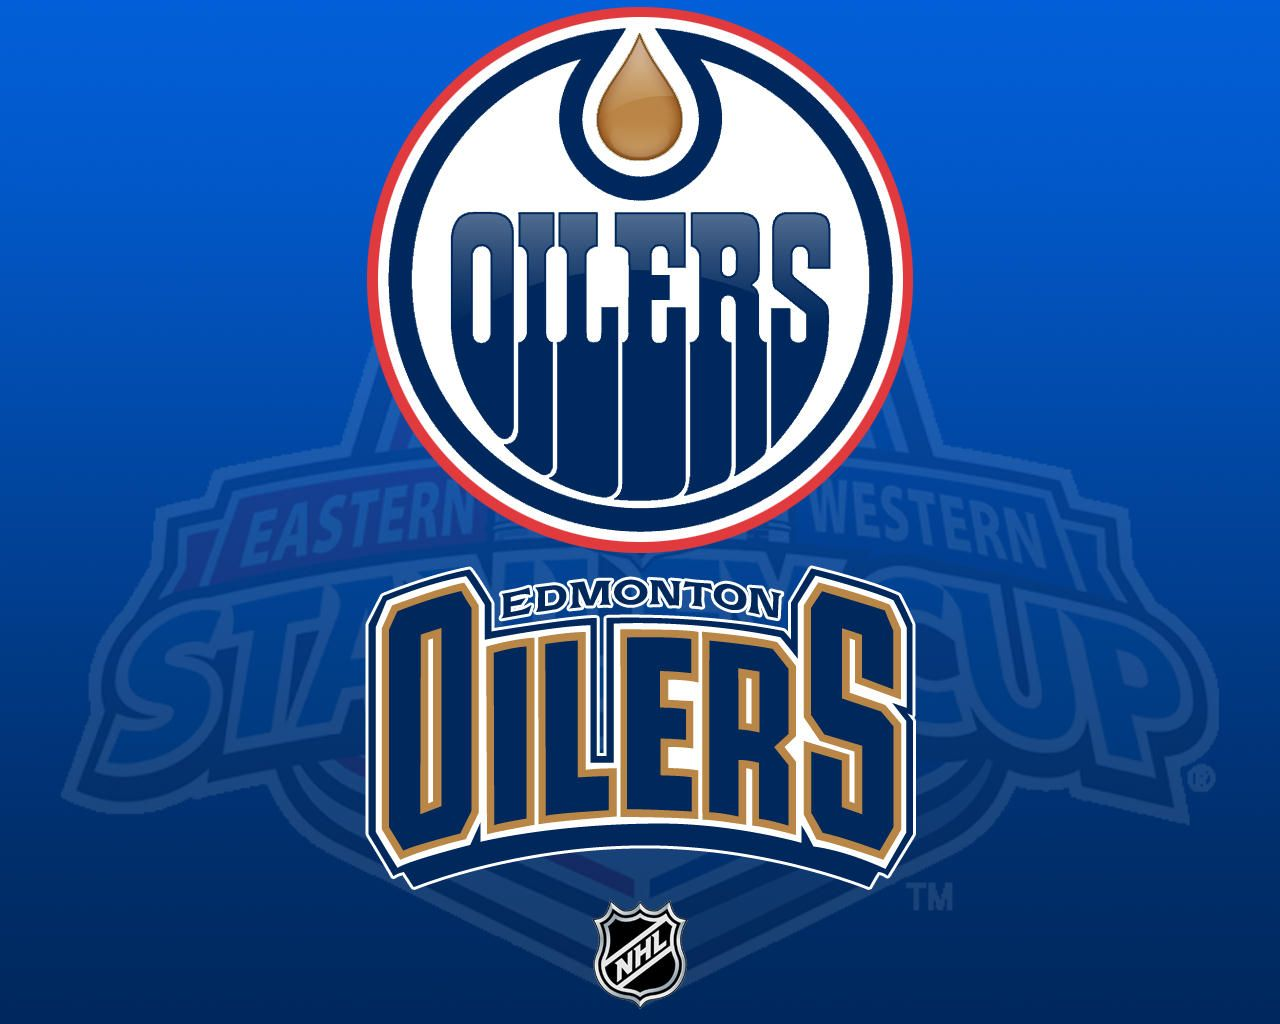 Good Wallpaper Logo Edmonton Oilers - 6848a59a34f3cd442cf0dab97b7d2b59  Photograph_219419.jpg